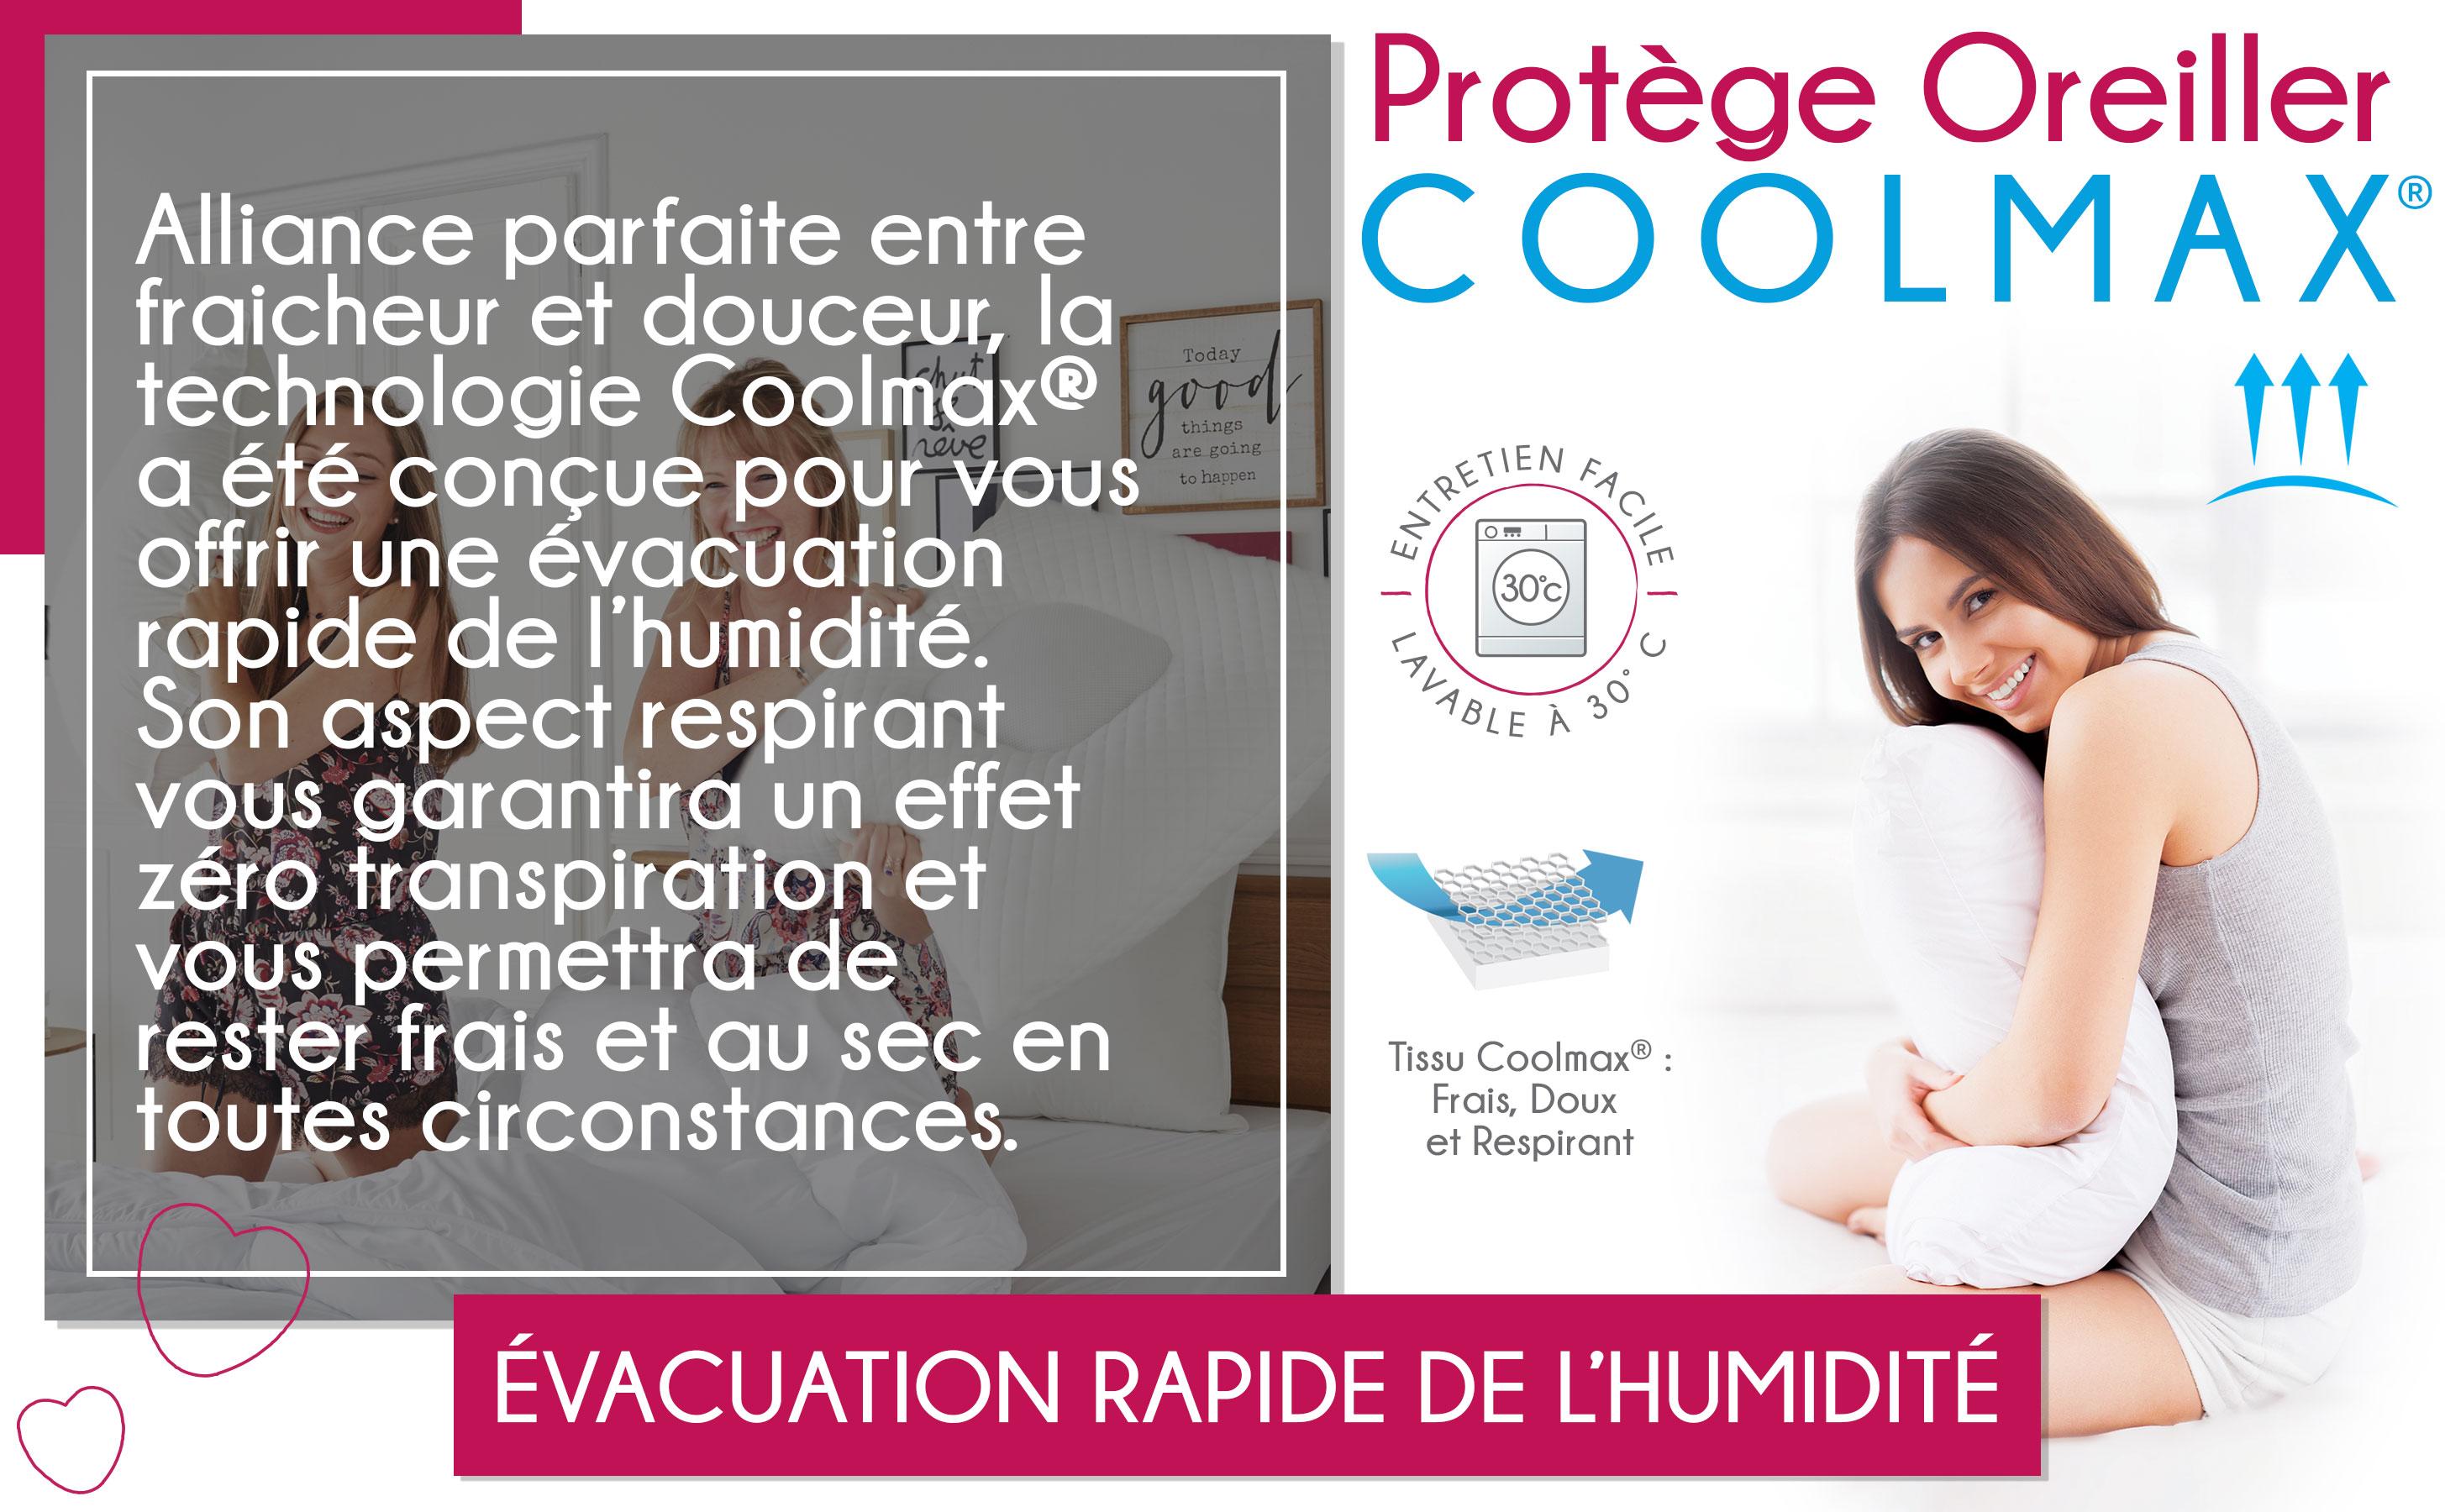 protège oreiller coolmax